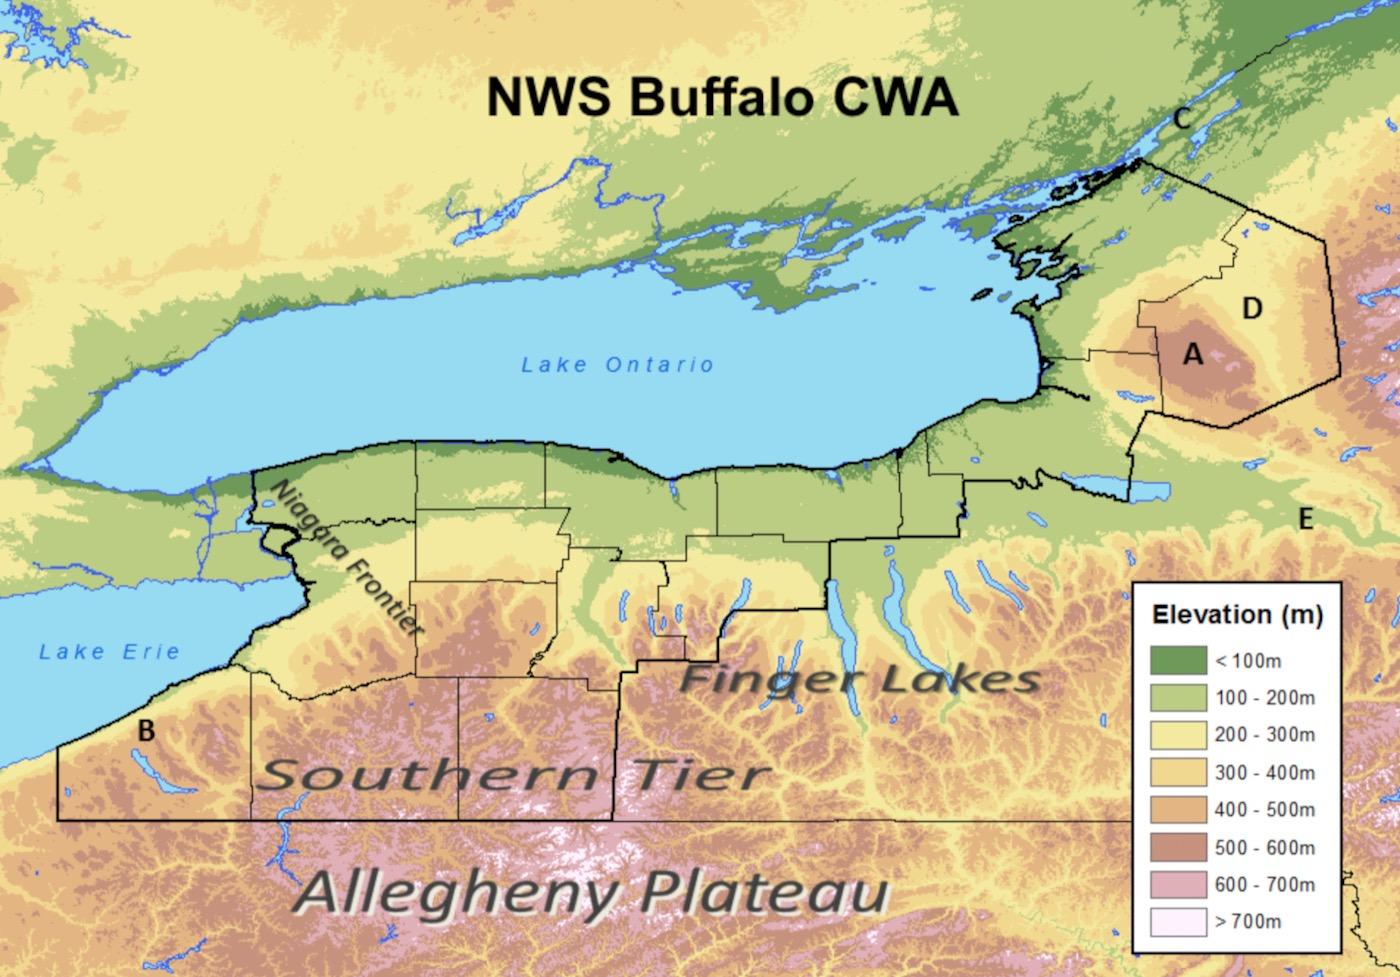 NWS BUF CWA elevations